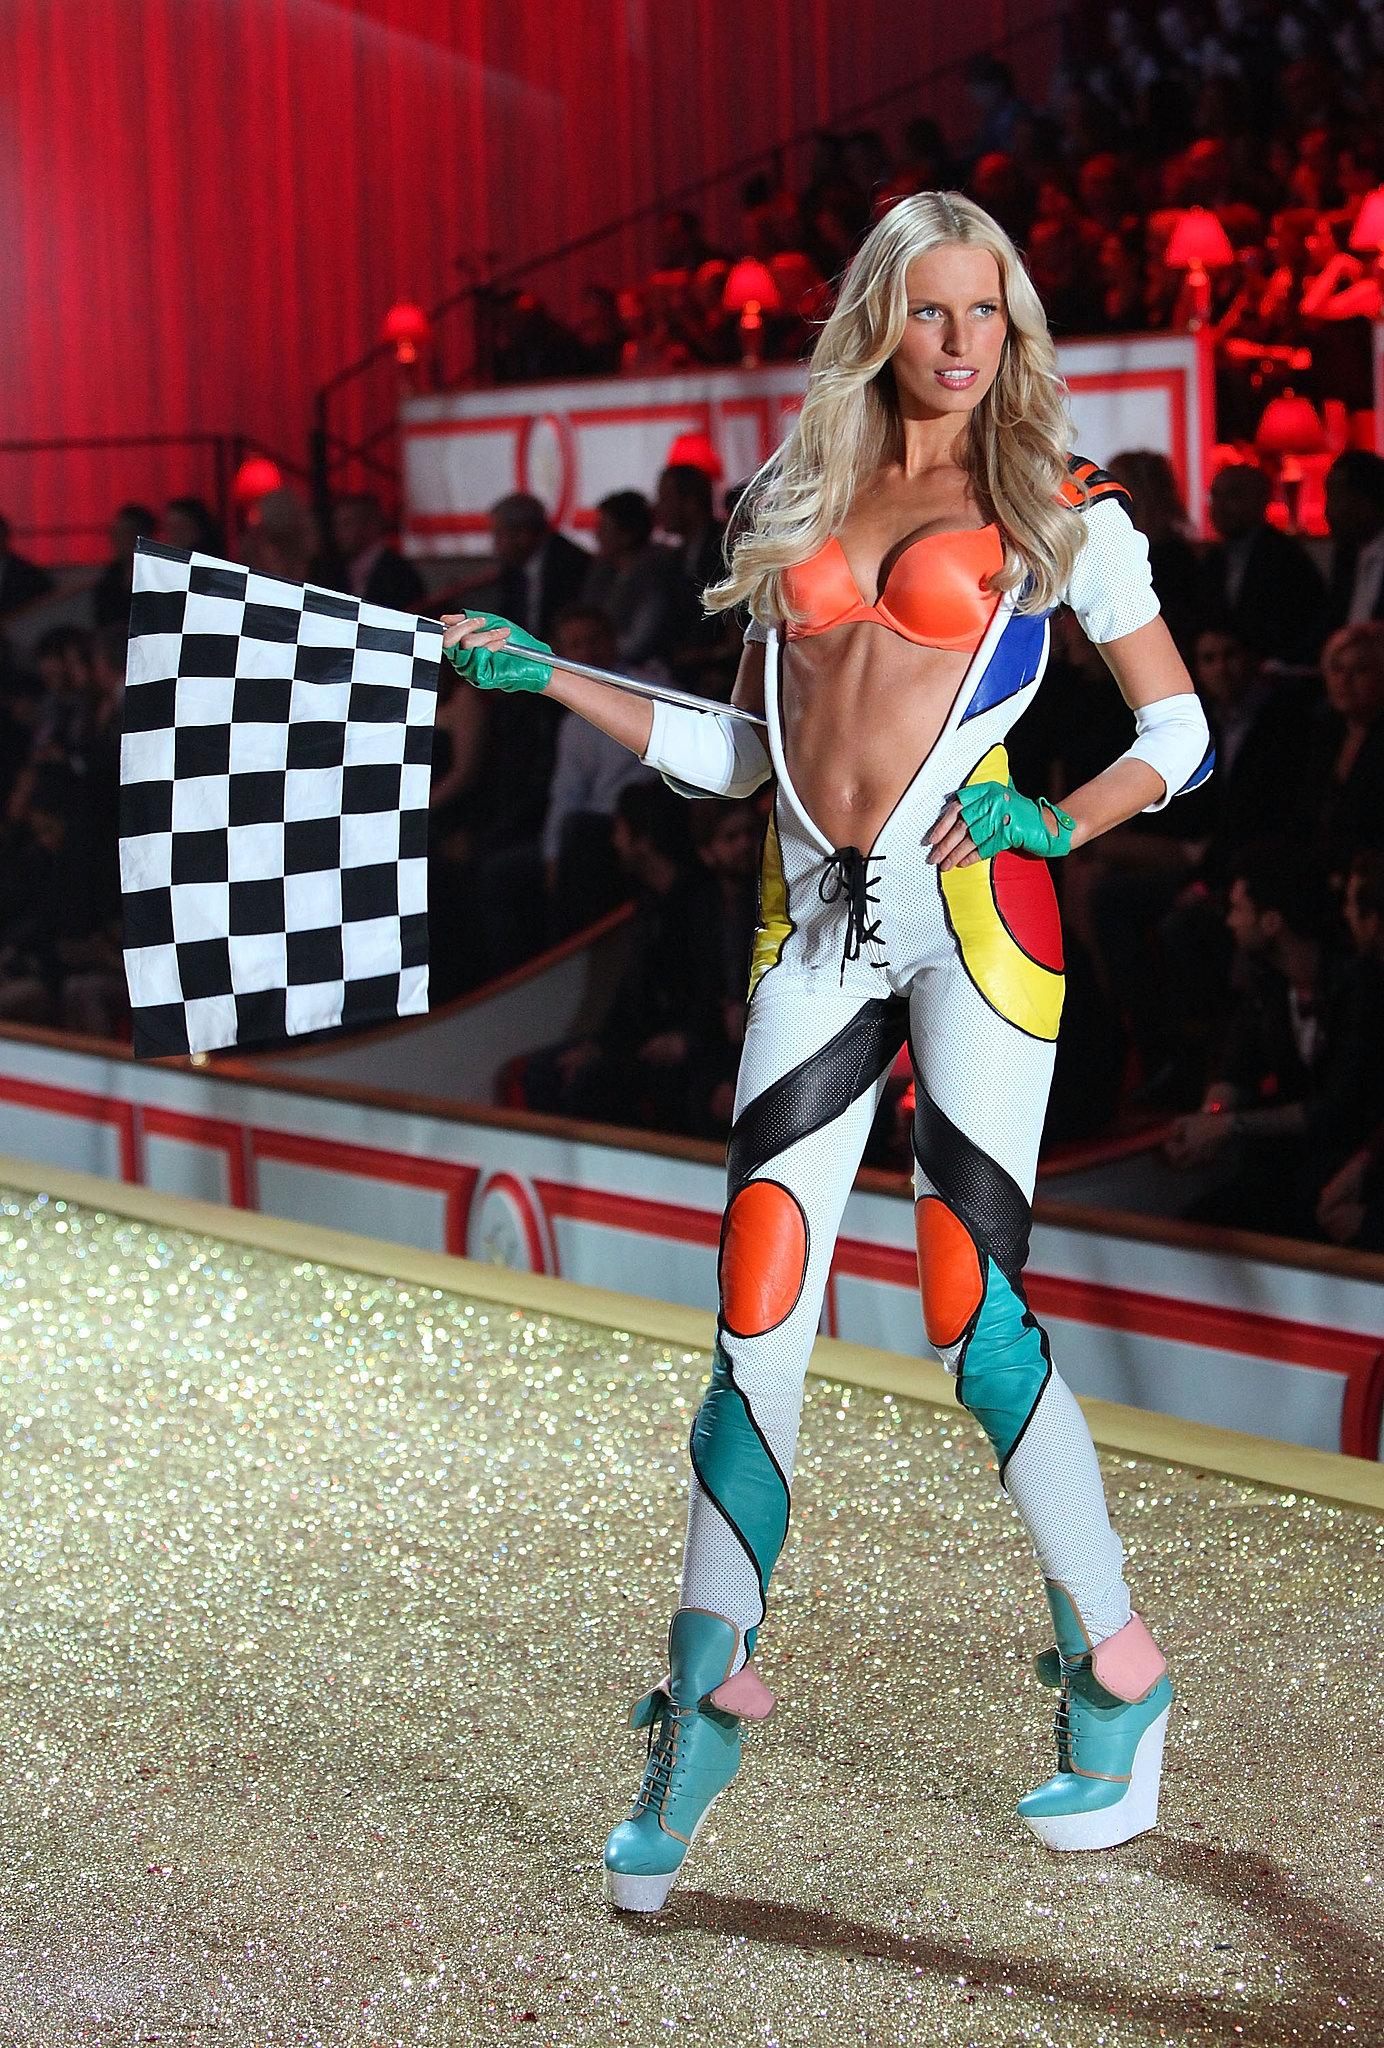 Karolina Kurkova sporty a sexy racing suit in 2010.